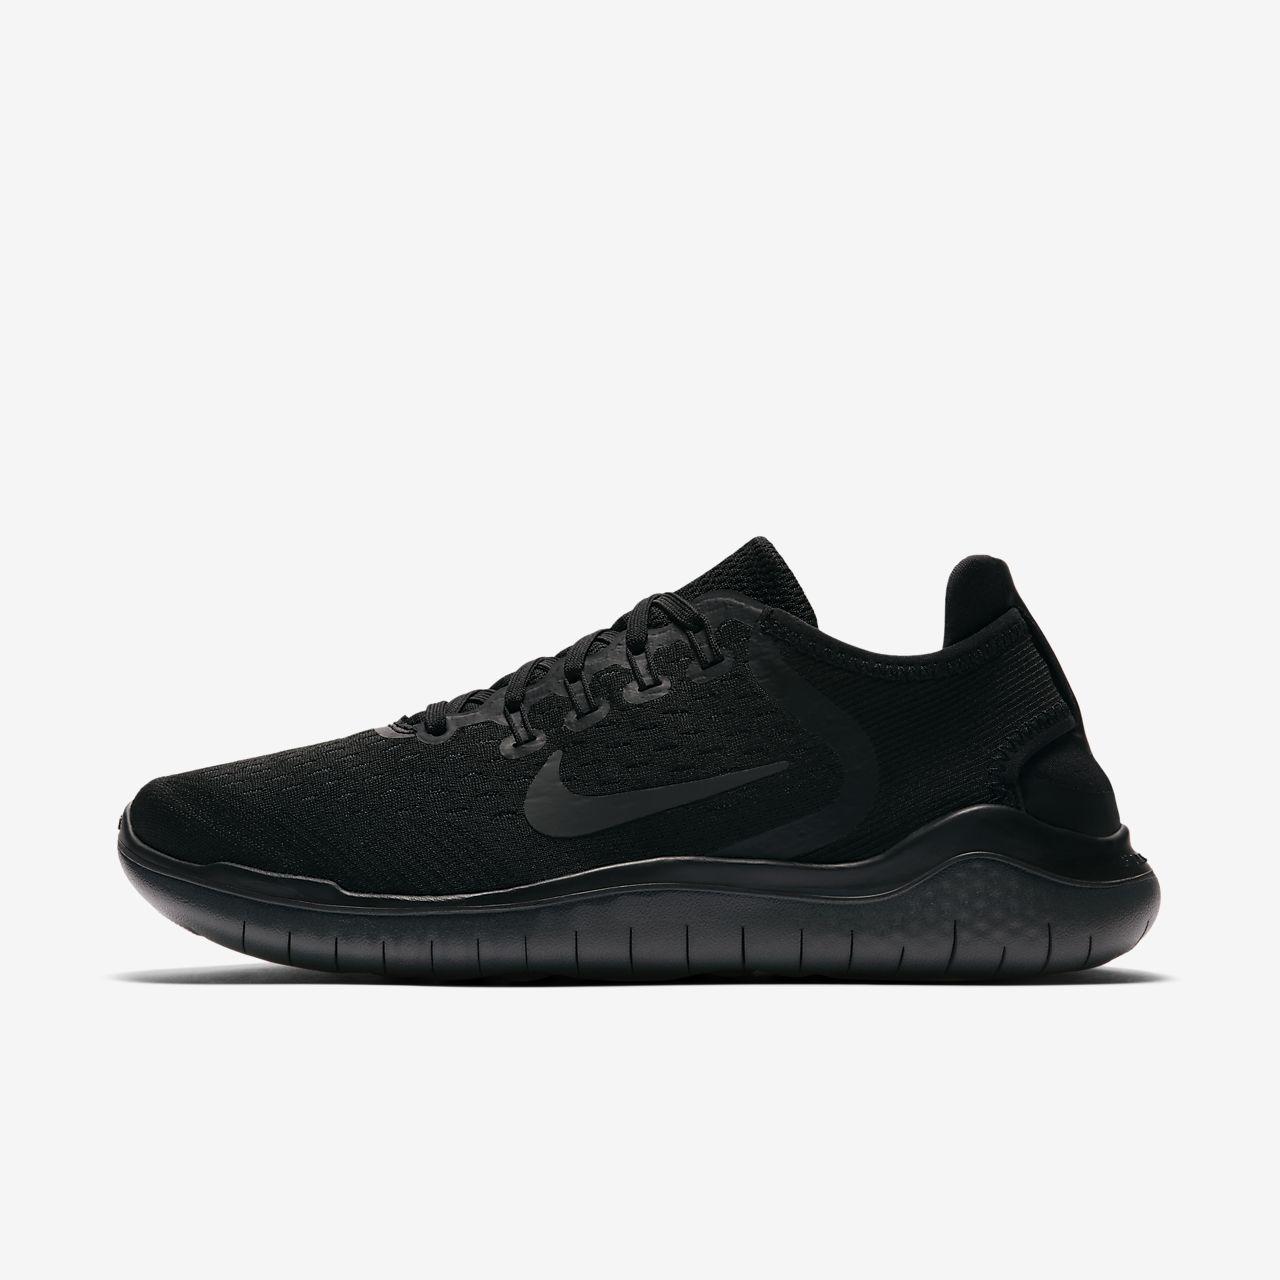 ... Nike Free RN 2018 Women's Running Shoe